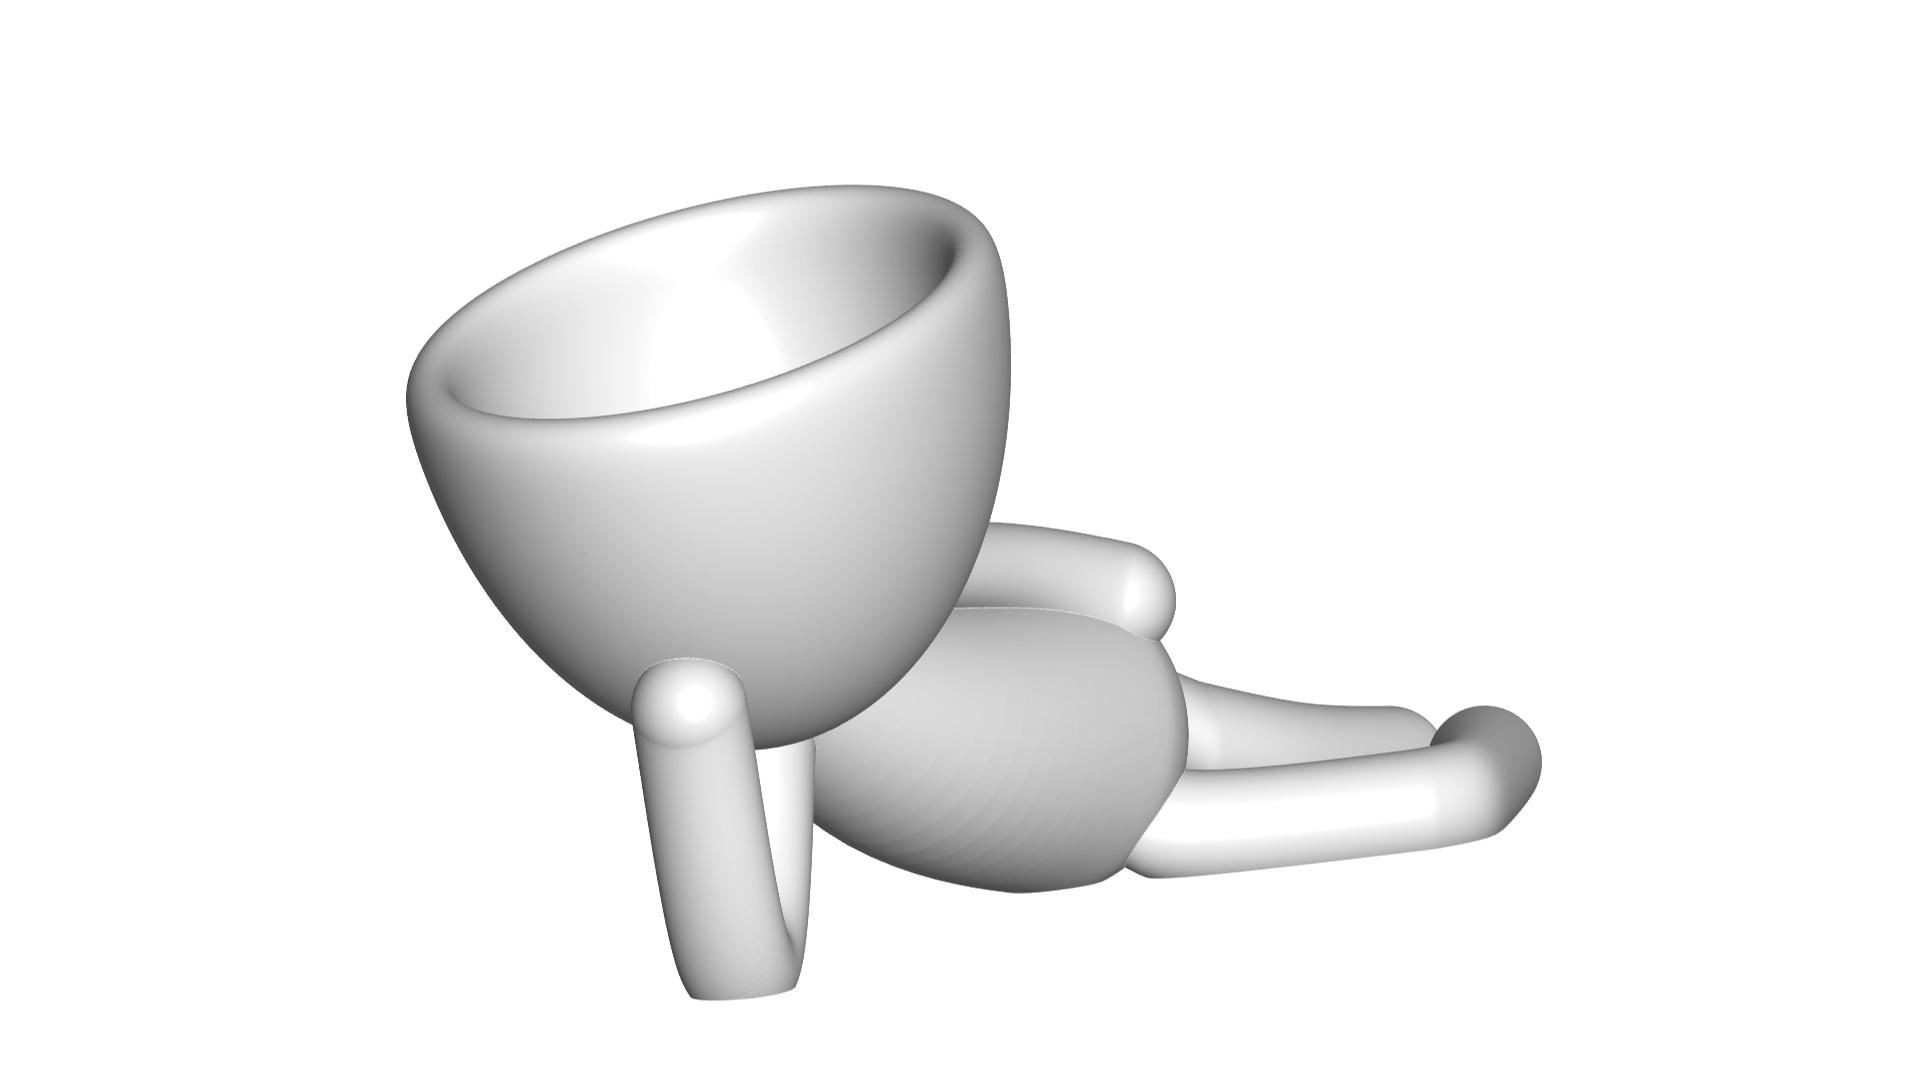 Vaso_10_Blanco_1.jpg Download free STL file JARRÓN MACETA ROBERT 10 - VASE FLOWERPOT ROBERT 10 • 3D printable object, PRODUSTL56